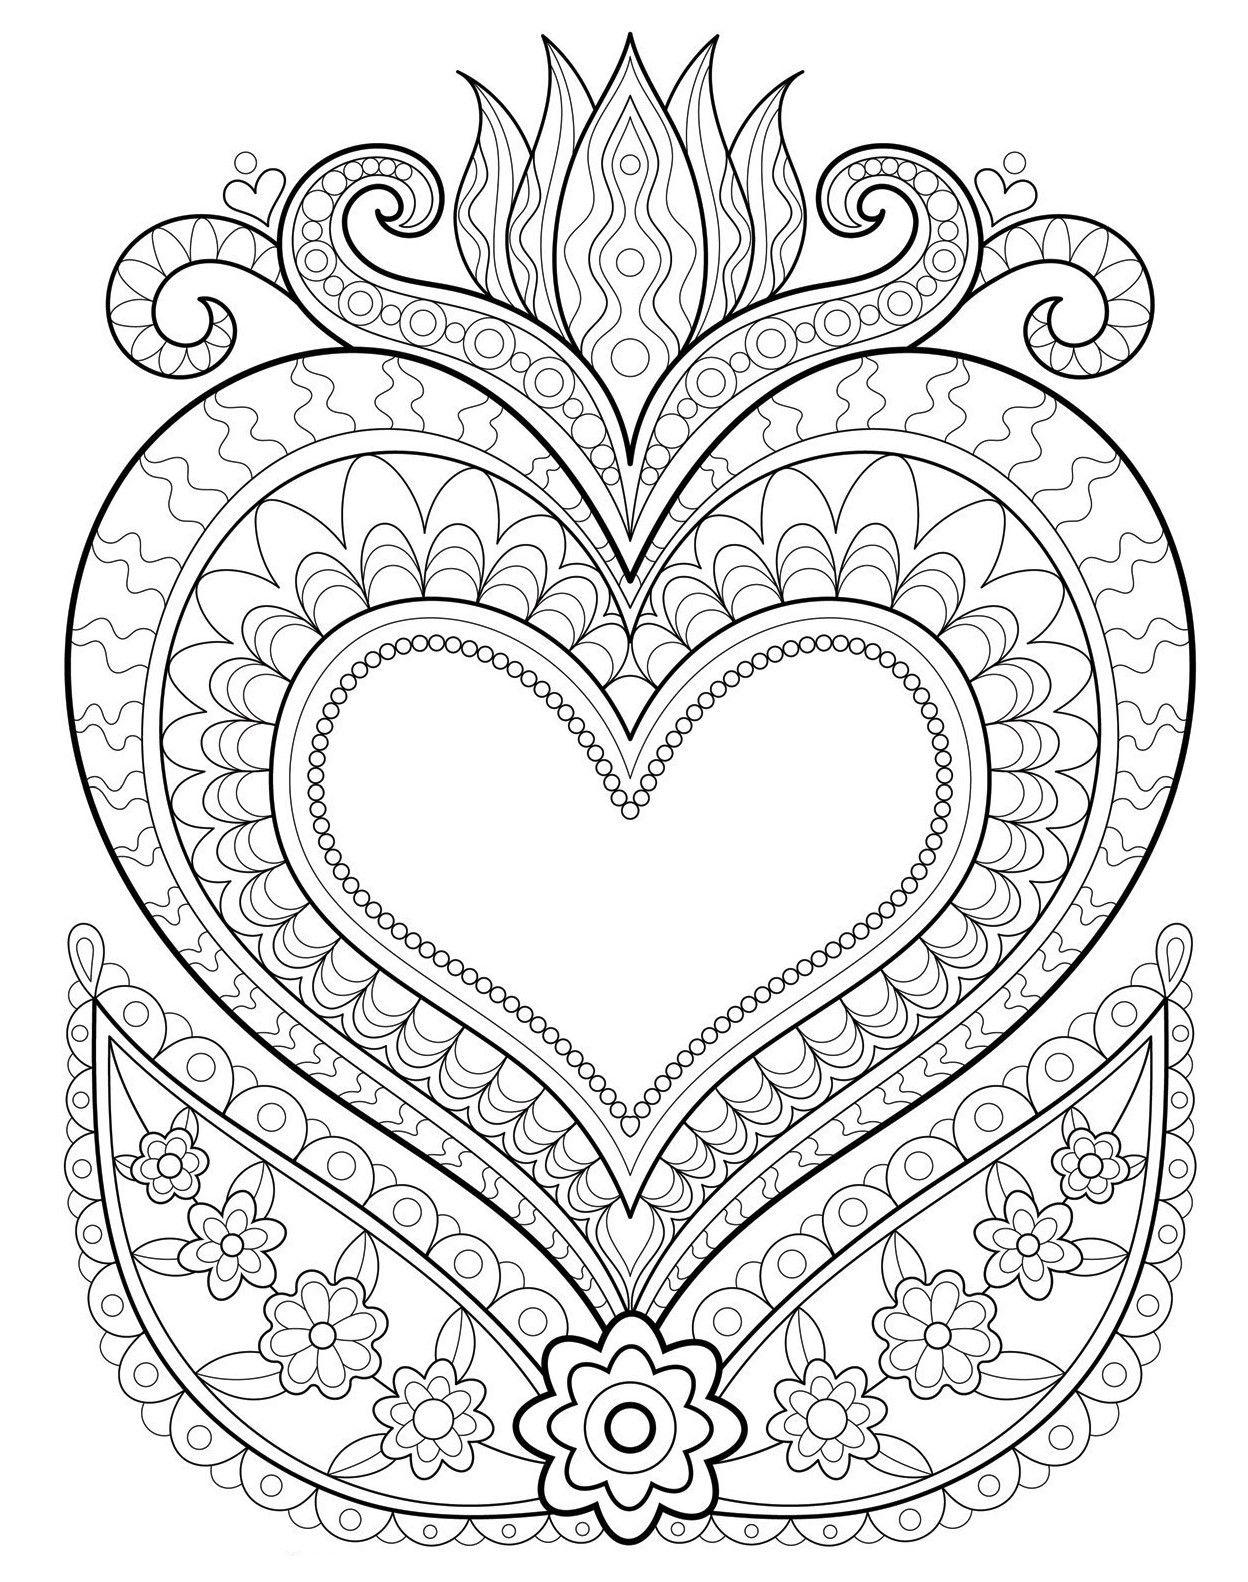 Раскраски «Сердца»  «Сердце в огне»  muster malvorlagen